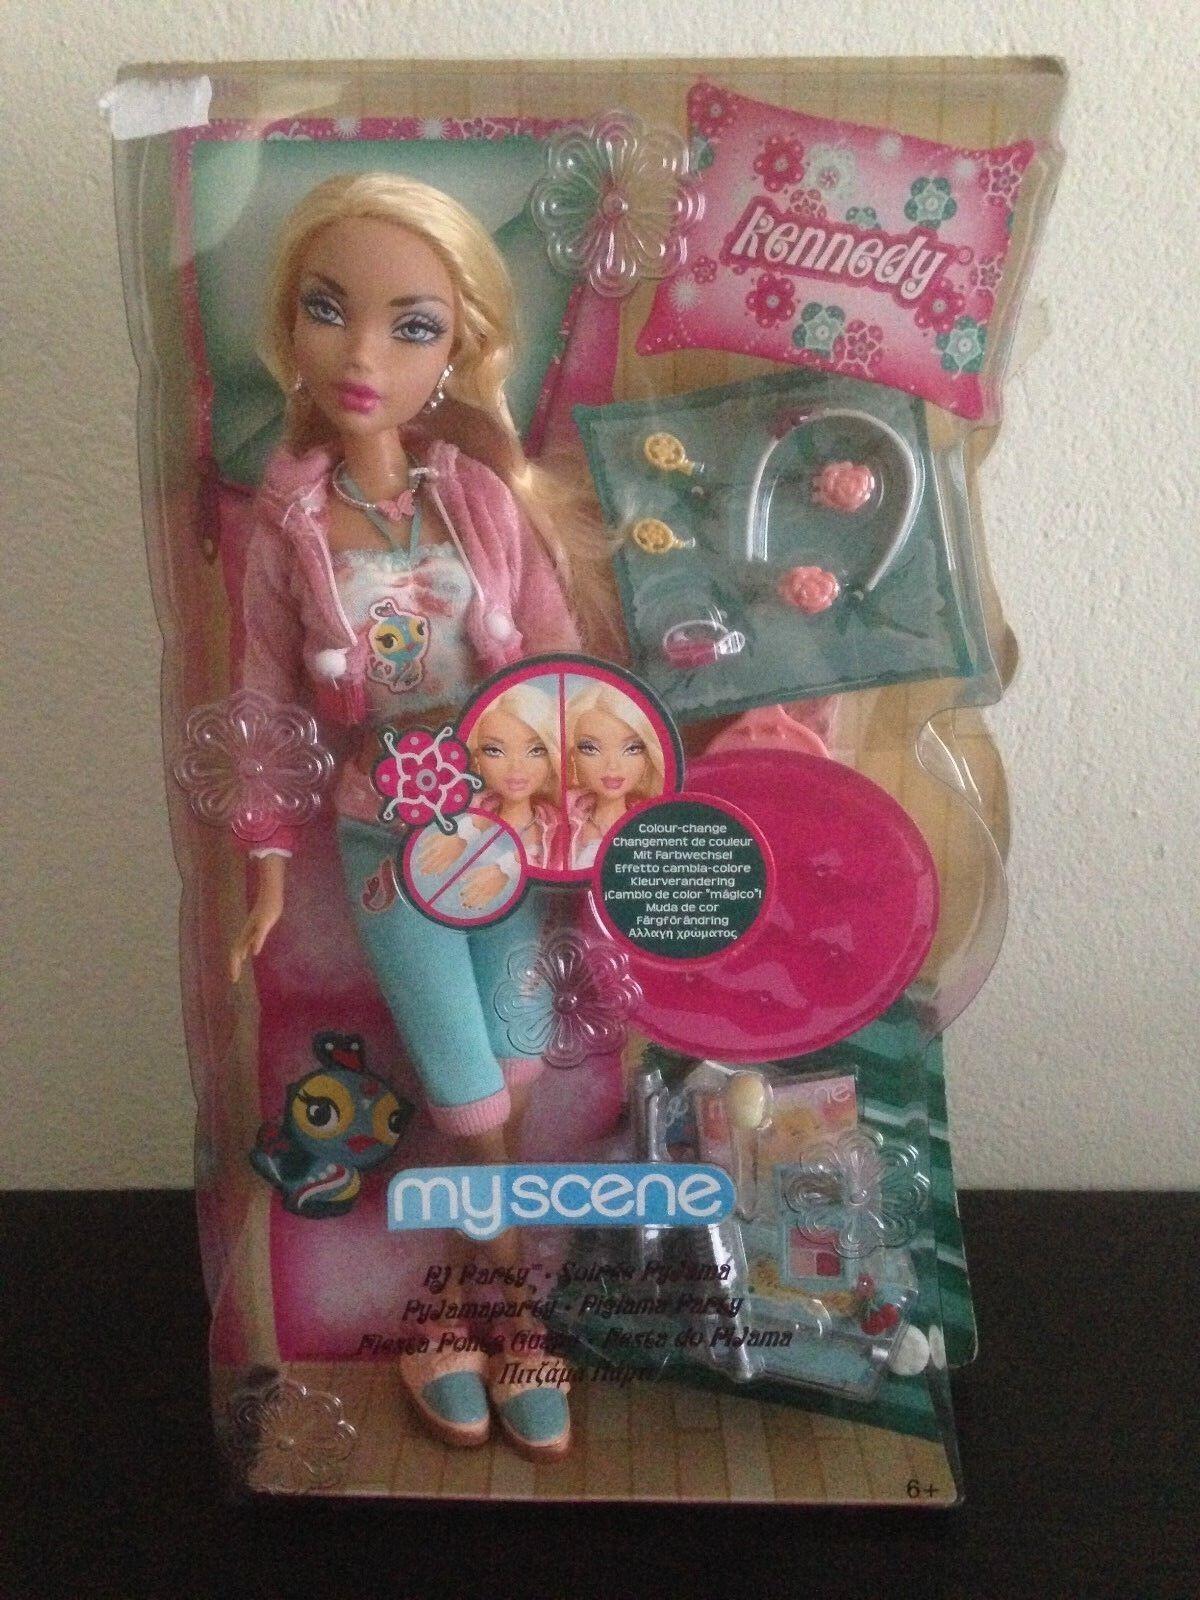 Barbie My Scene PJ Fiesta Kennedy Rubia Muñeca duro encontrar nuevas